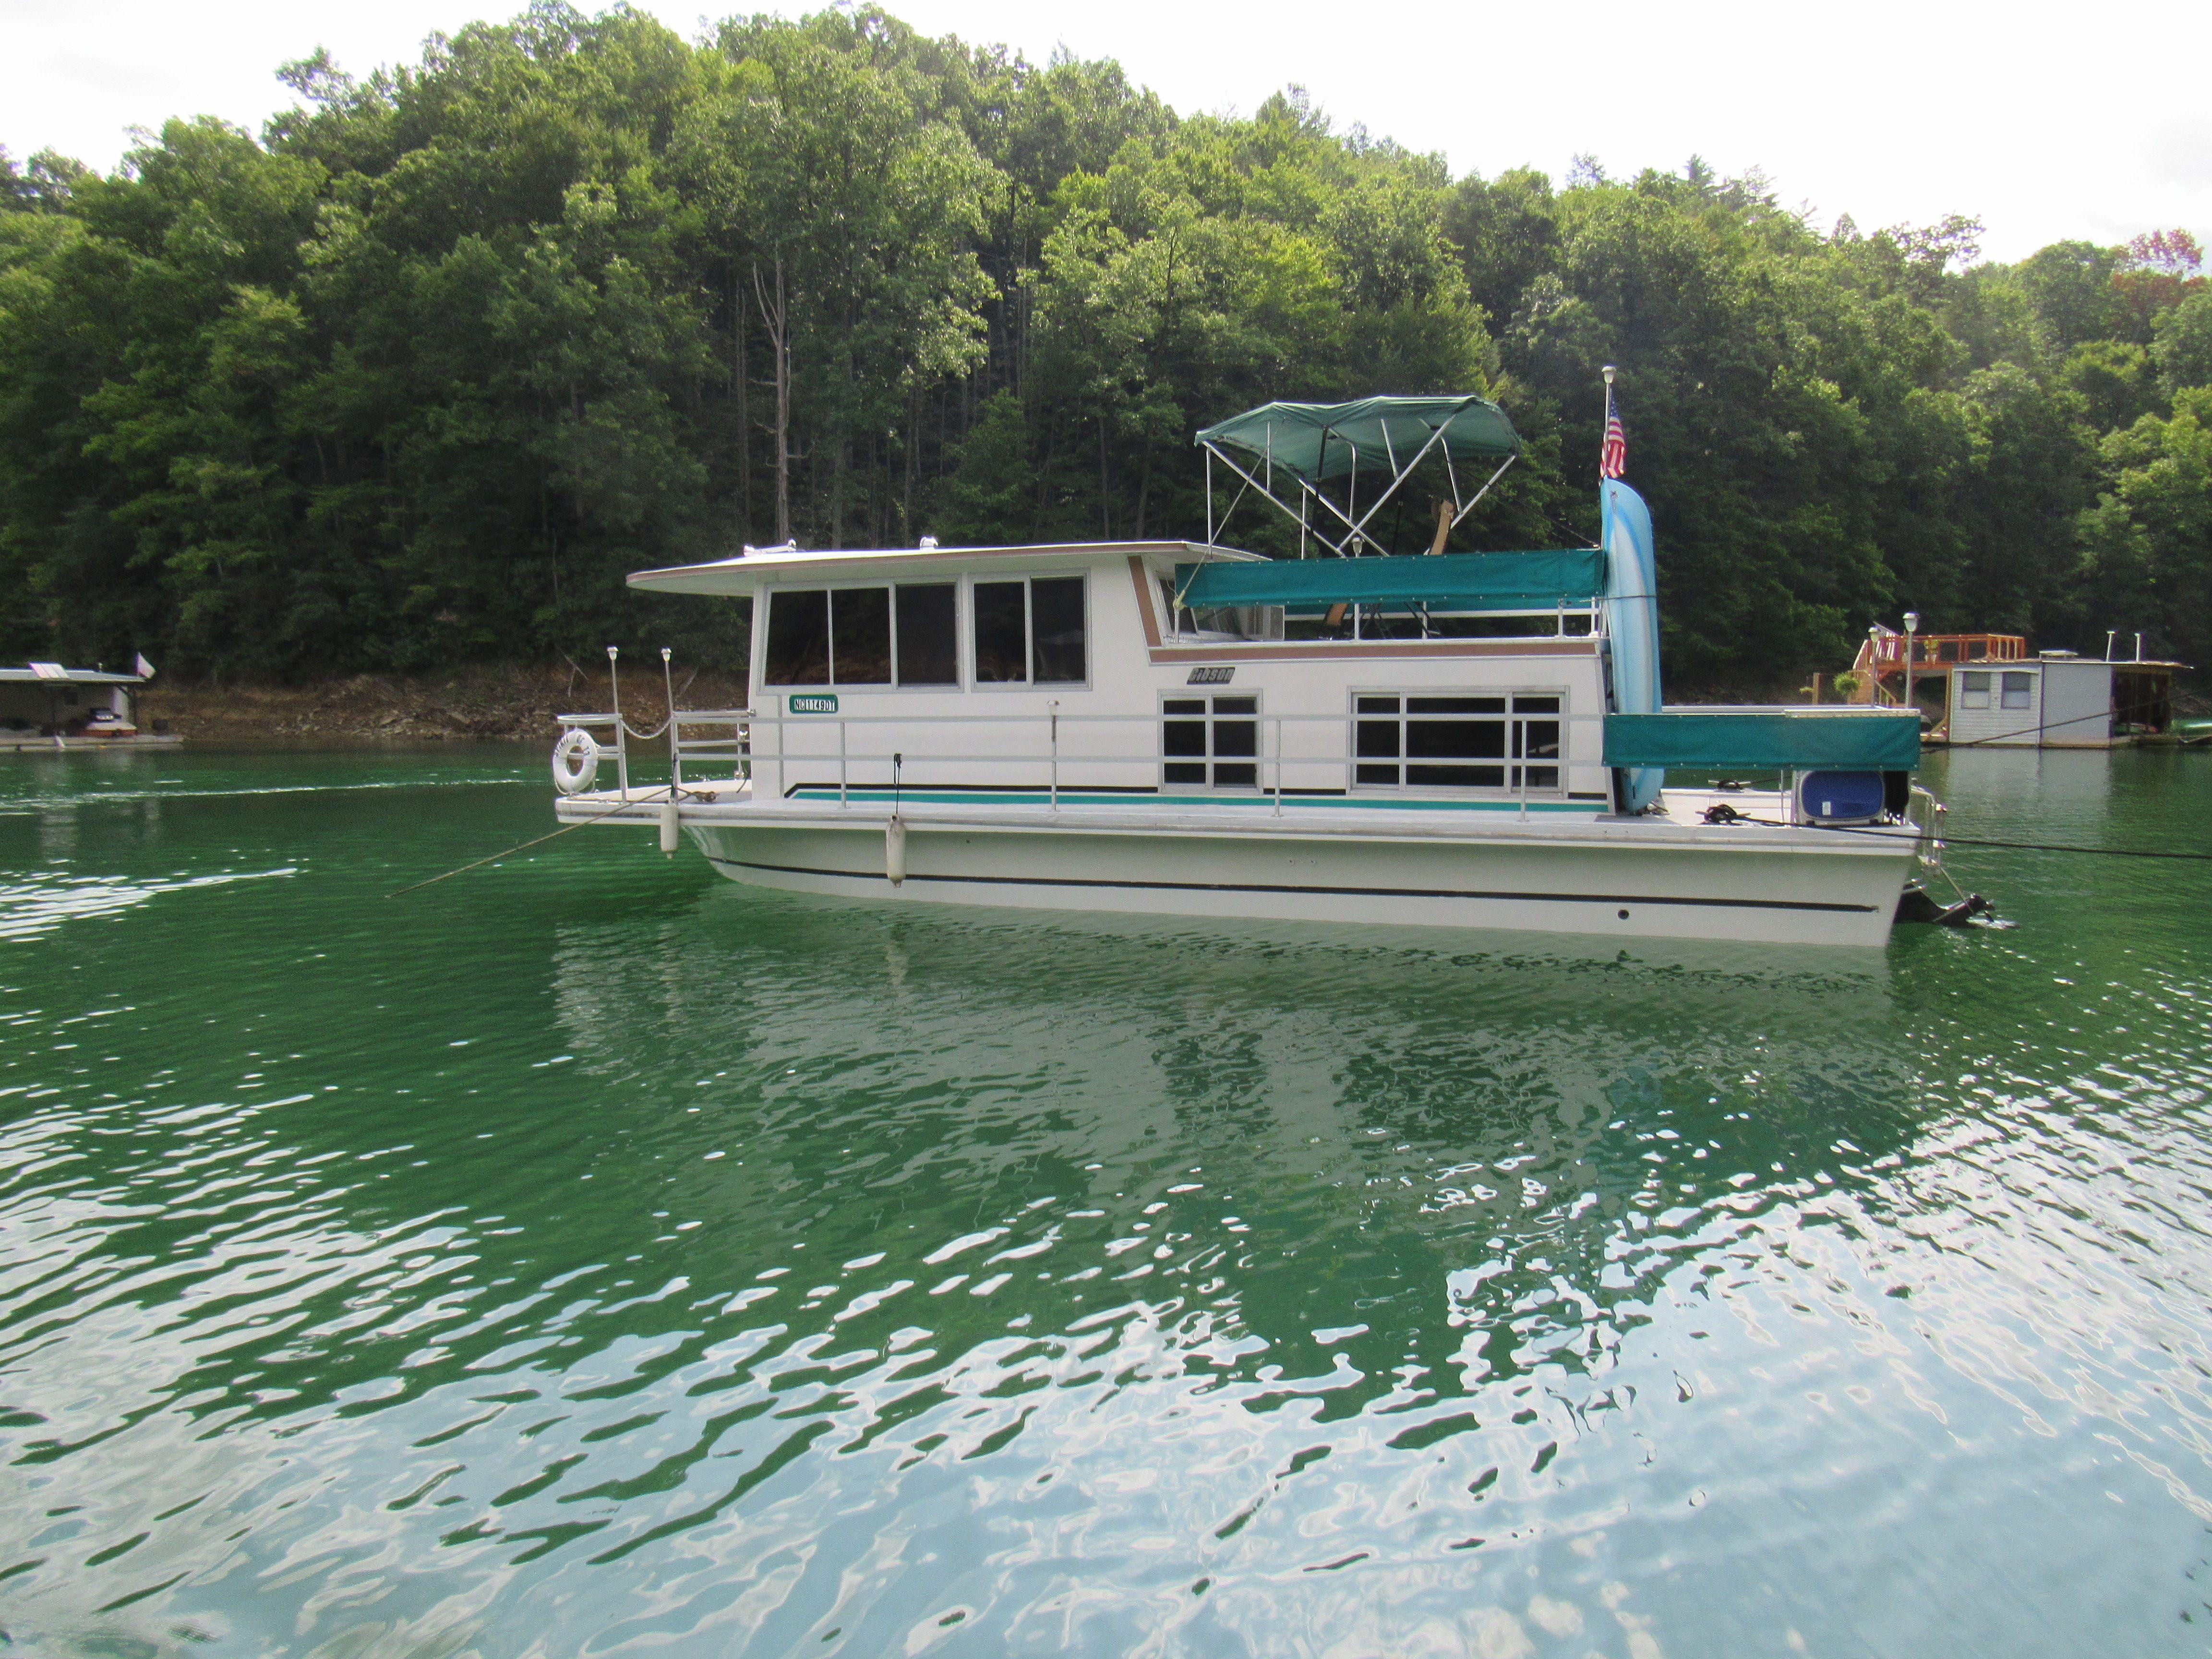 gibson sport series houseboat | Gibson 37 ft Sport Series Houseboat | Books  Worth Reading | Pinterest | House